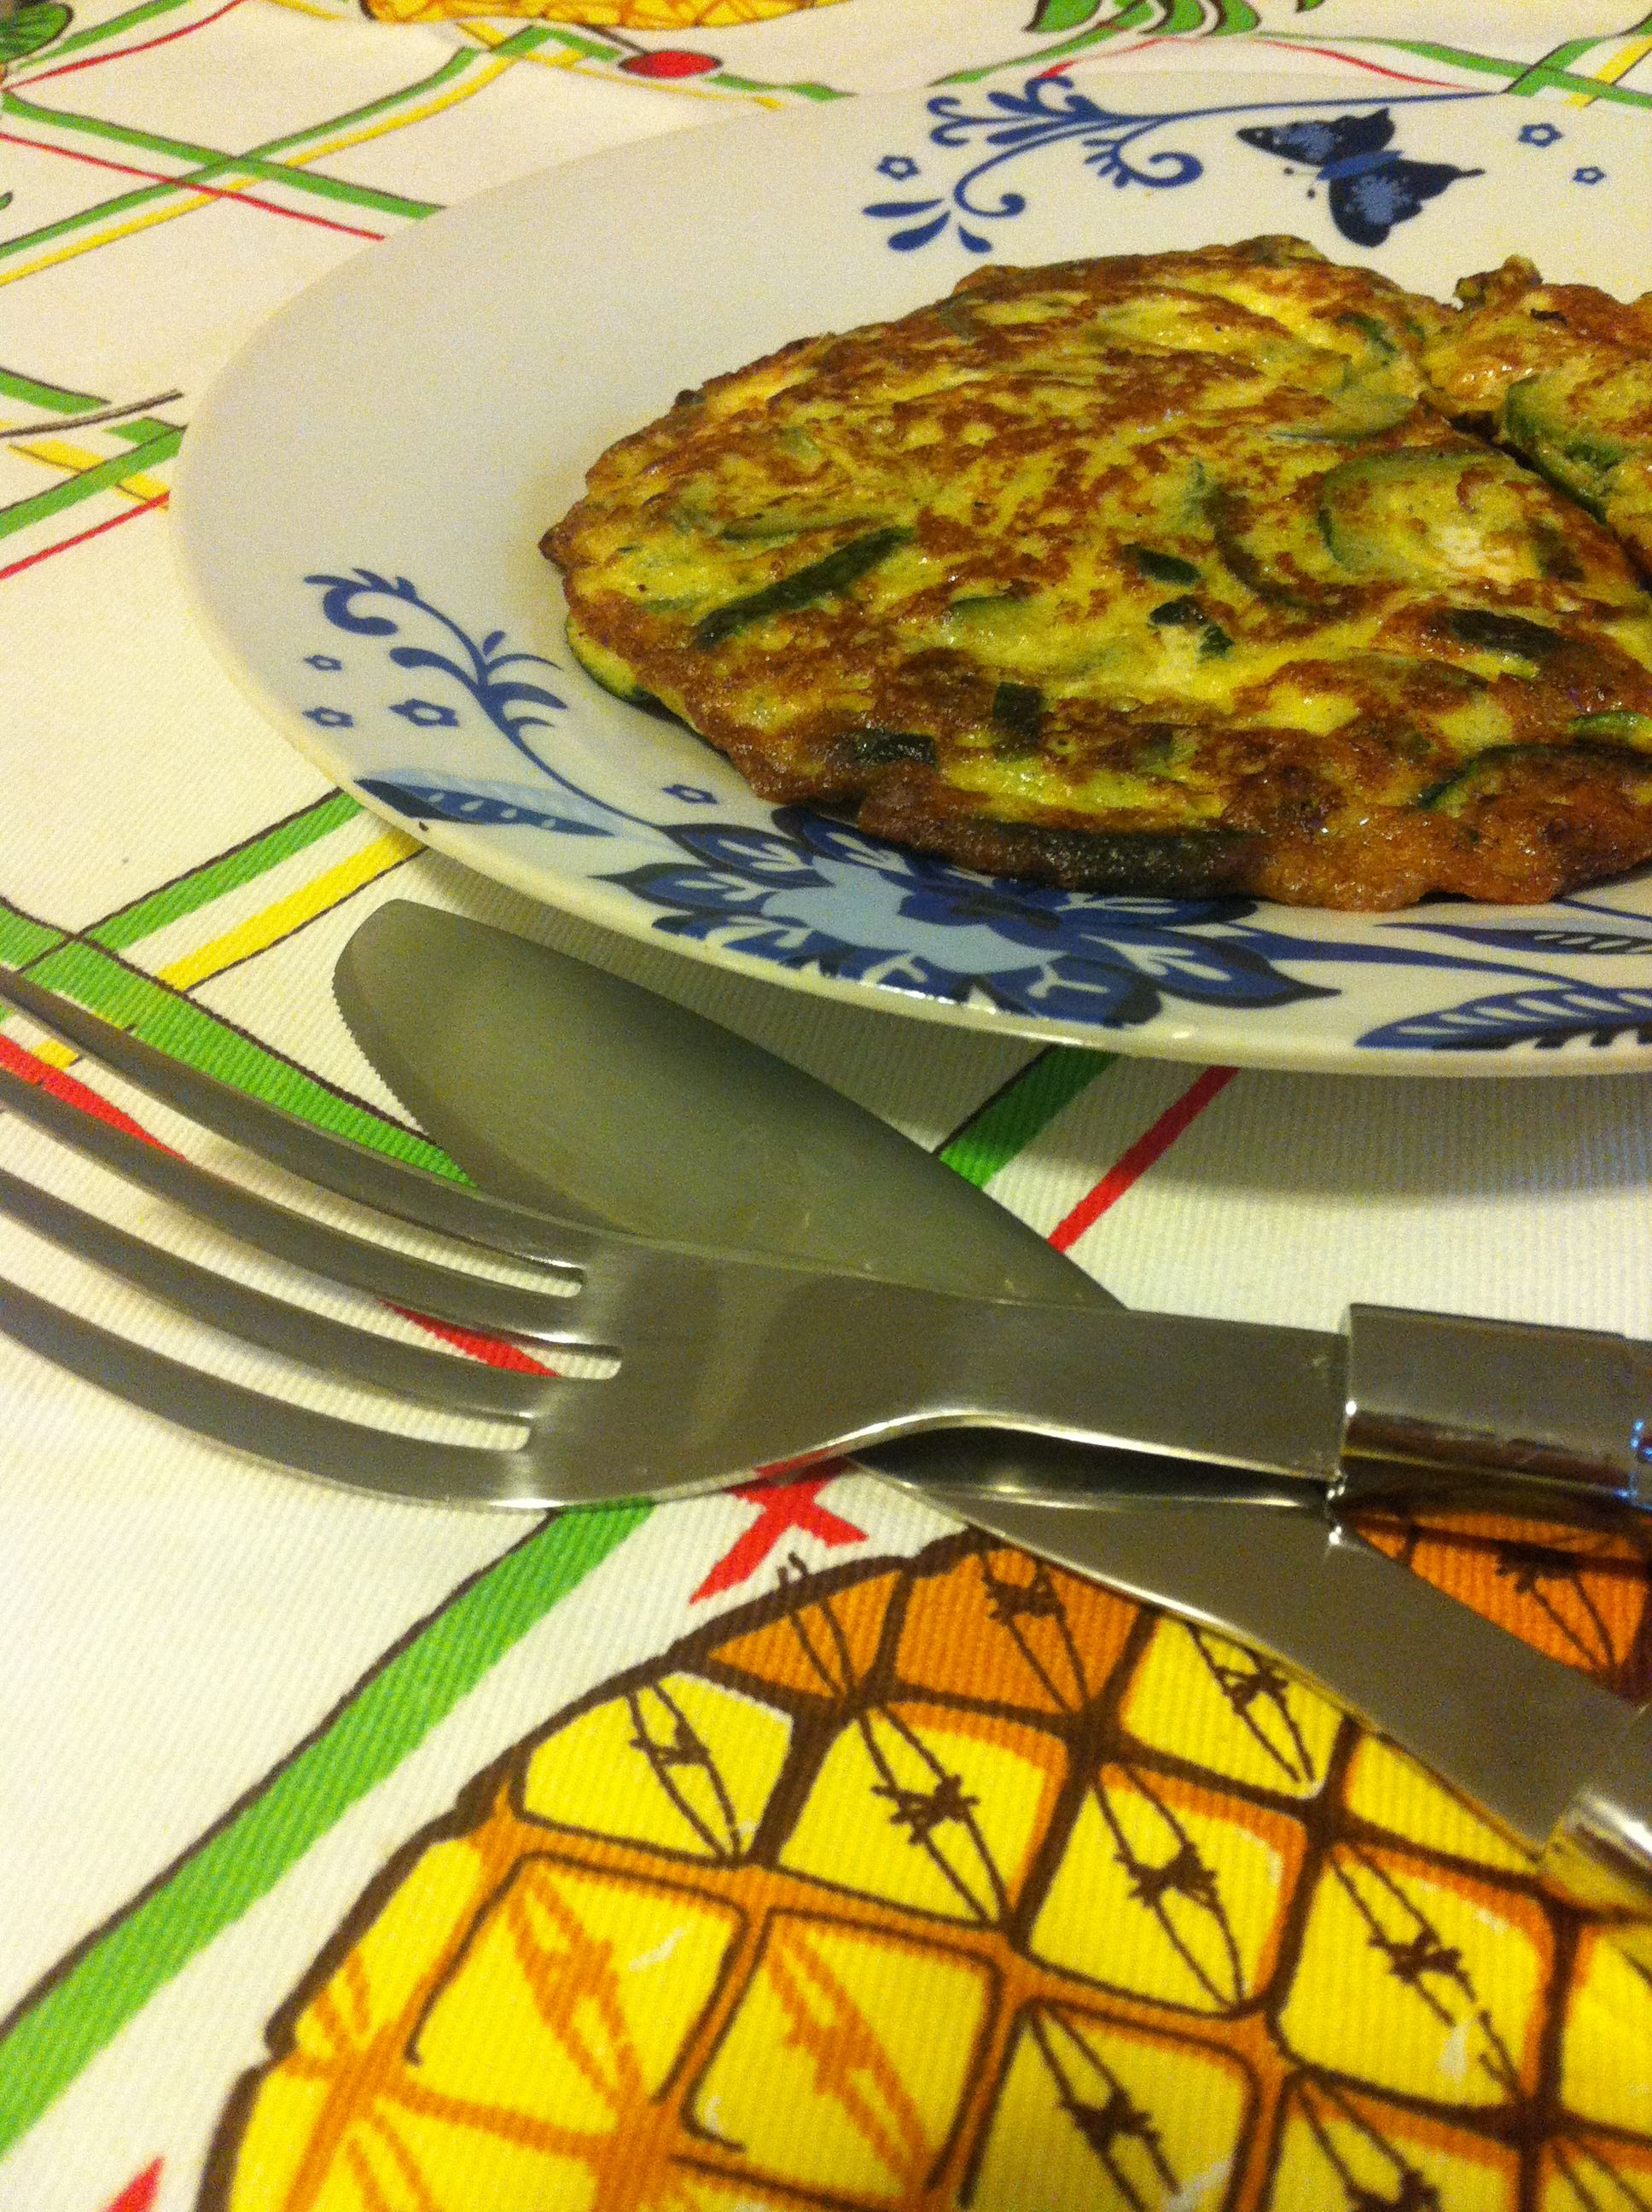 My zucchini omelet.. So good